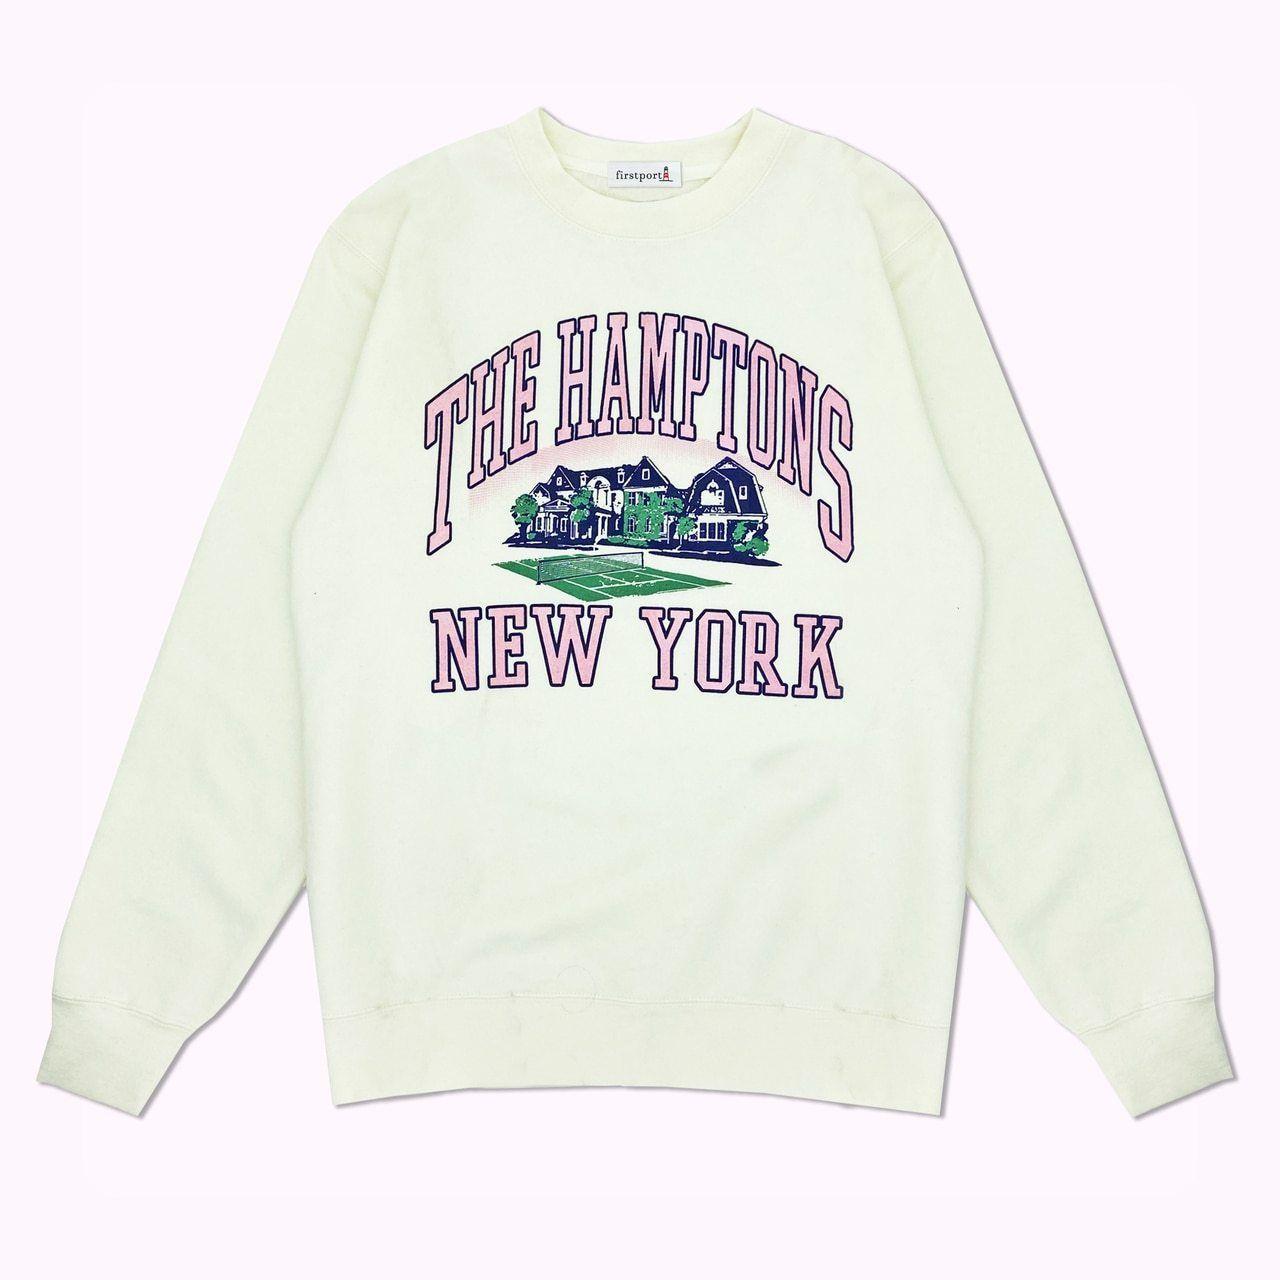 The Hamptons New York Crewneck Sweatshirt Artist Series Light Ivory In 2021 New York Sweatshirt Crew Neck Sweatshirt Sweatshirts [ 1280 x 1280 Pixel ]